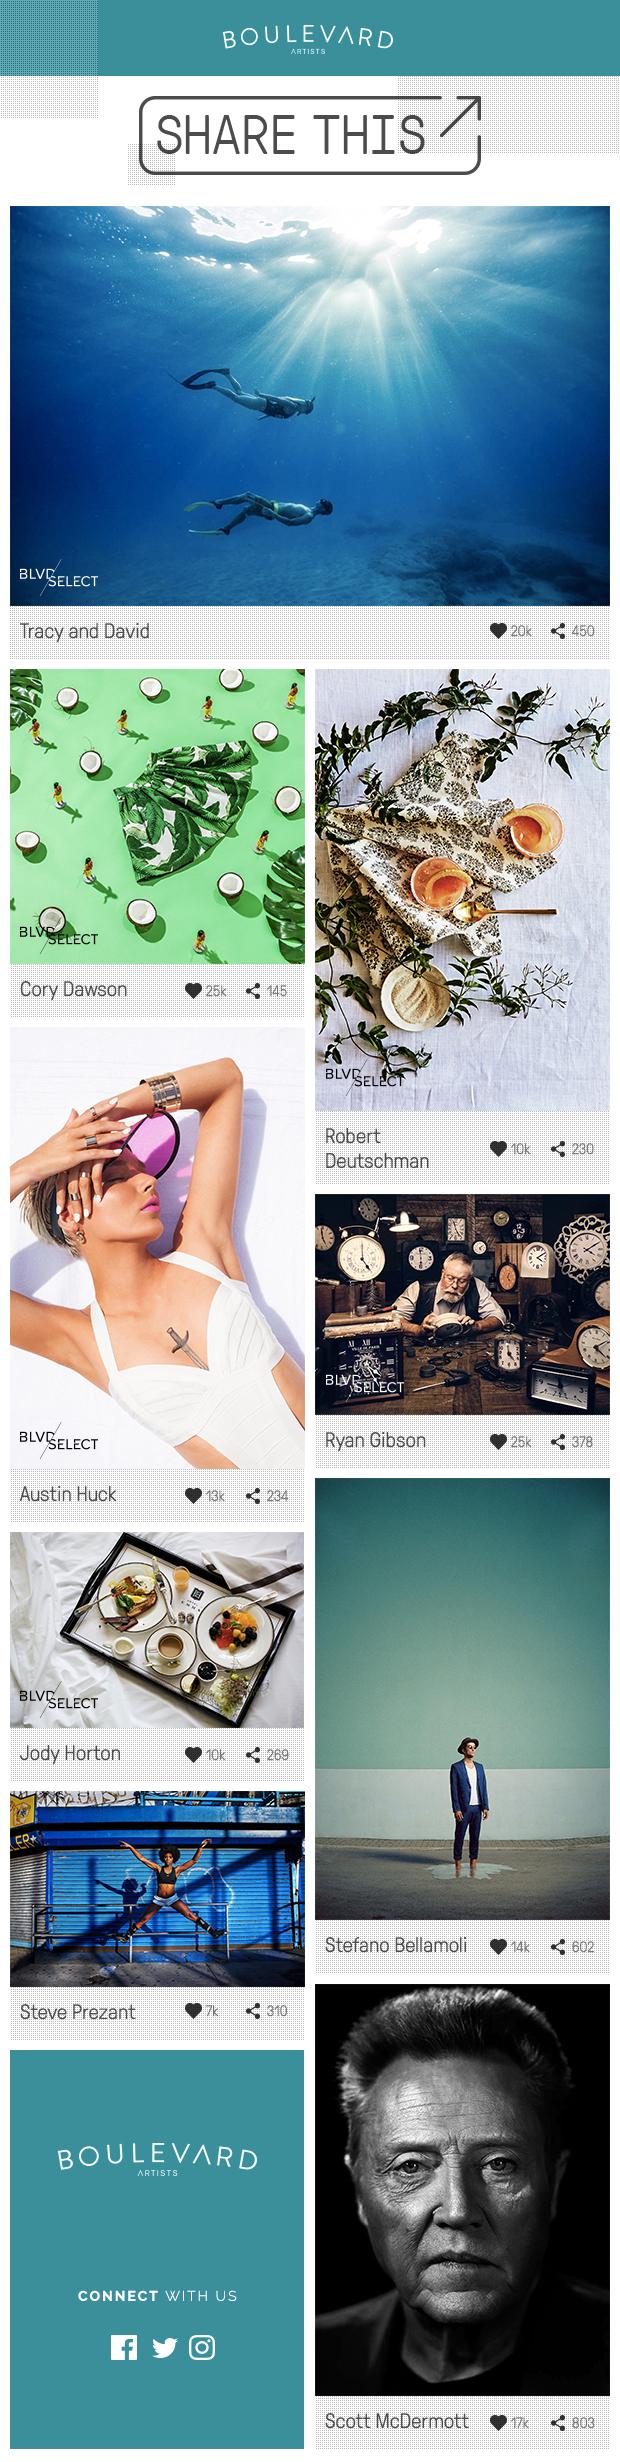 Share-This---The-Social-Media-Edit-a02.jpg